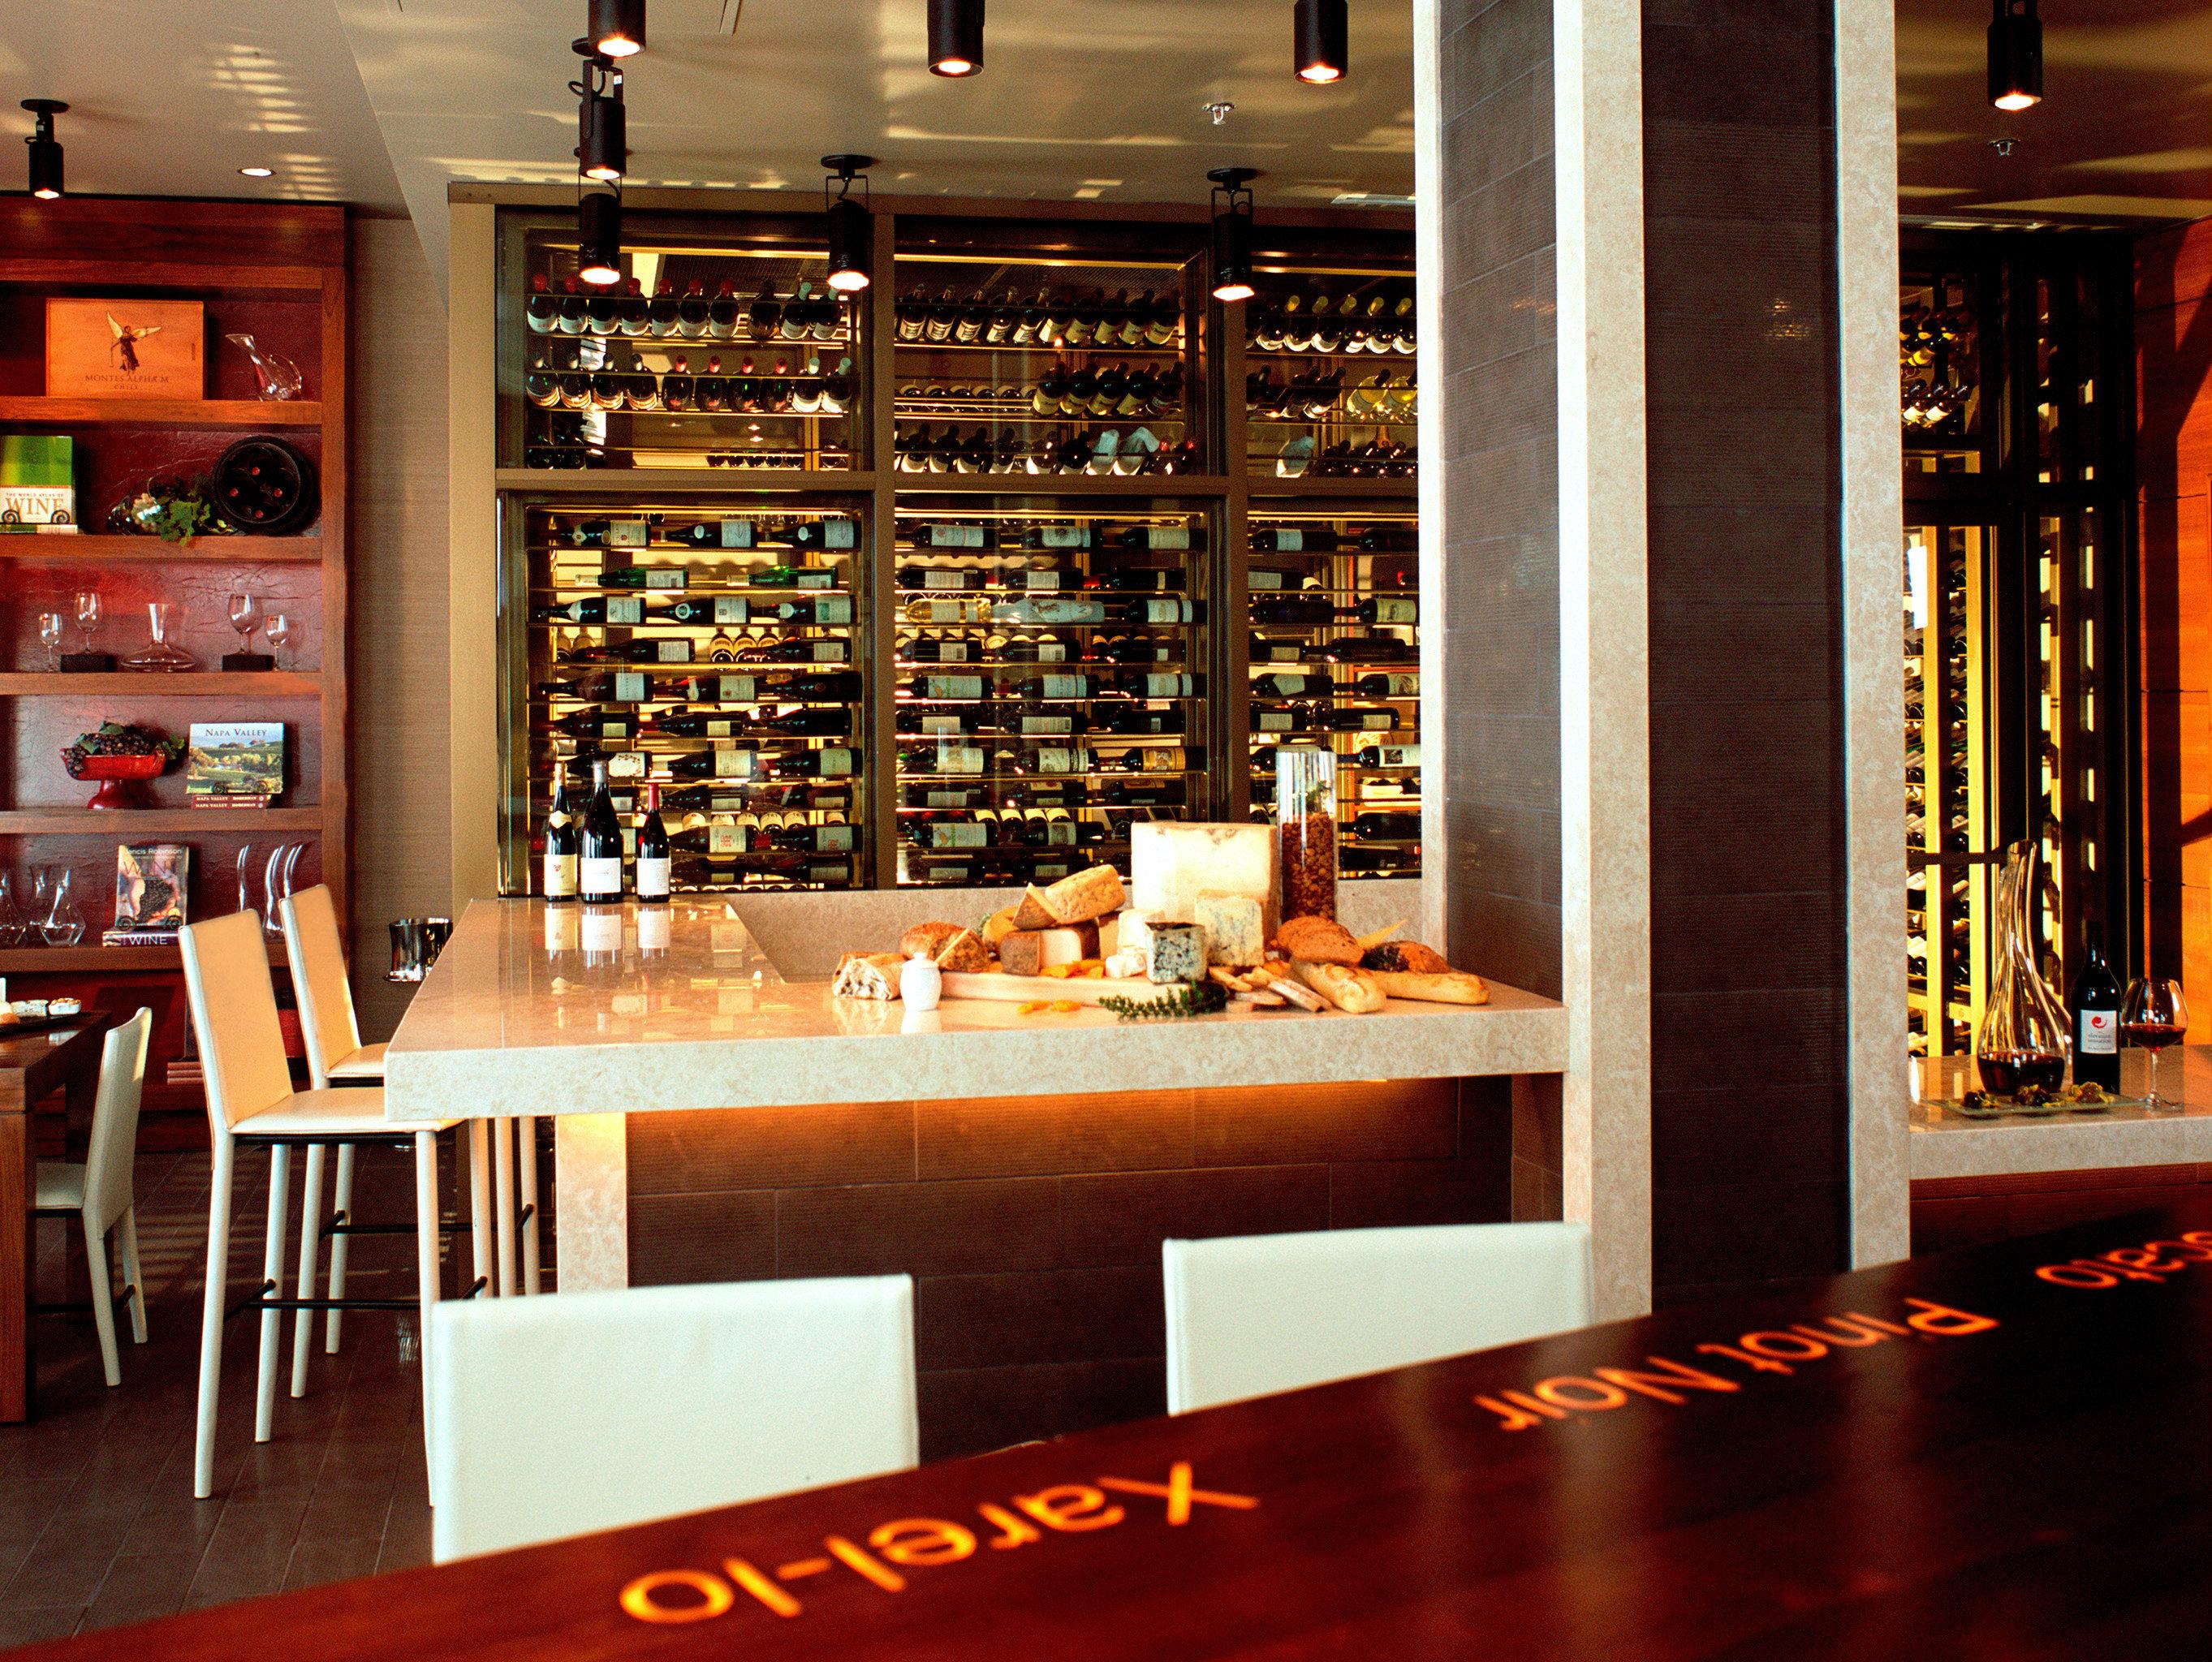 Bar Drink Ocean Waterfront Wine-Tasting shelf restaurant retail Boutique Dining